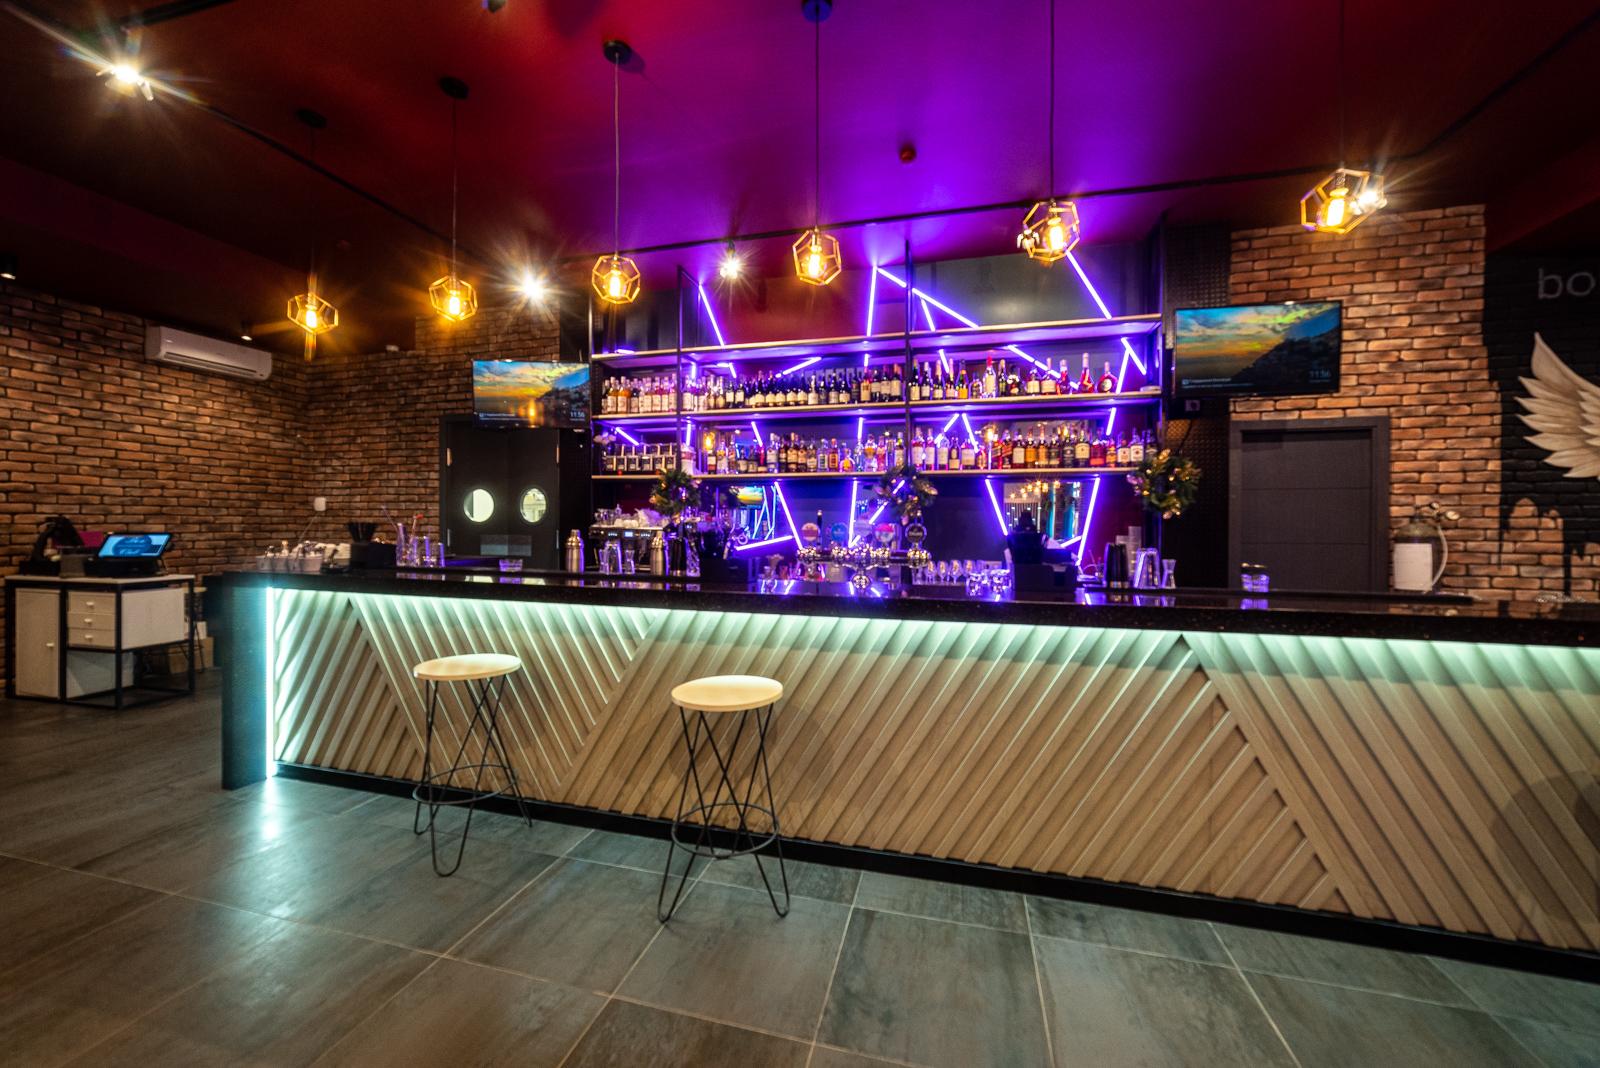 ресторан-бар, дизайн ресторана в стиле лофт, дизайн ресторана под ключ, дизайн коммерческих помещений, дизайн интерьера, дизайн ресторана